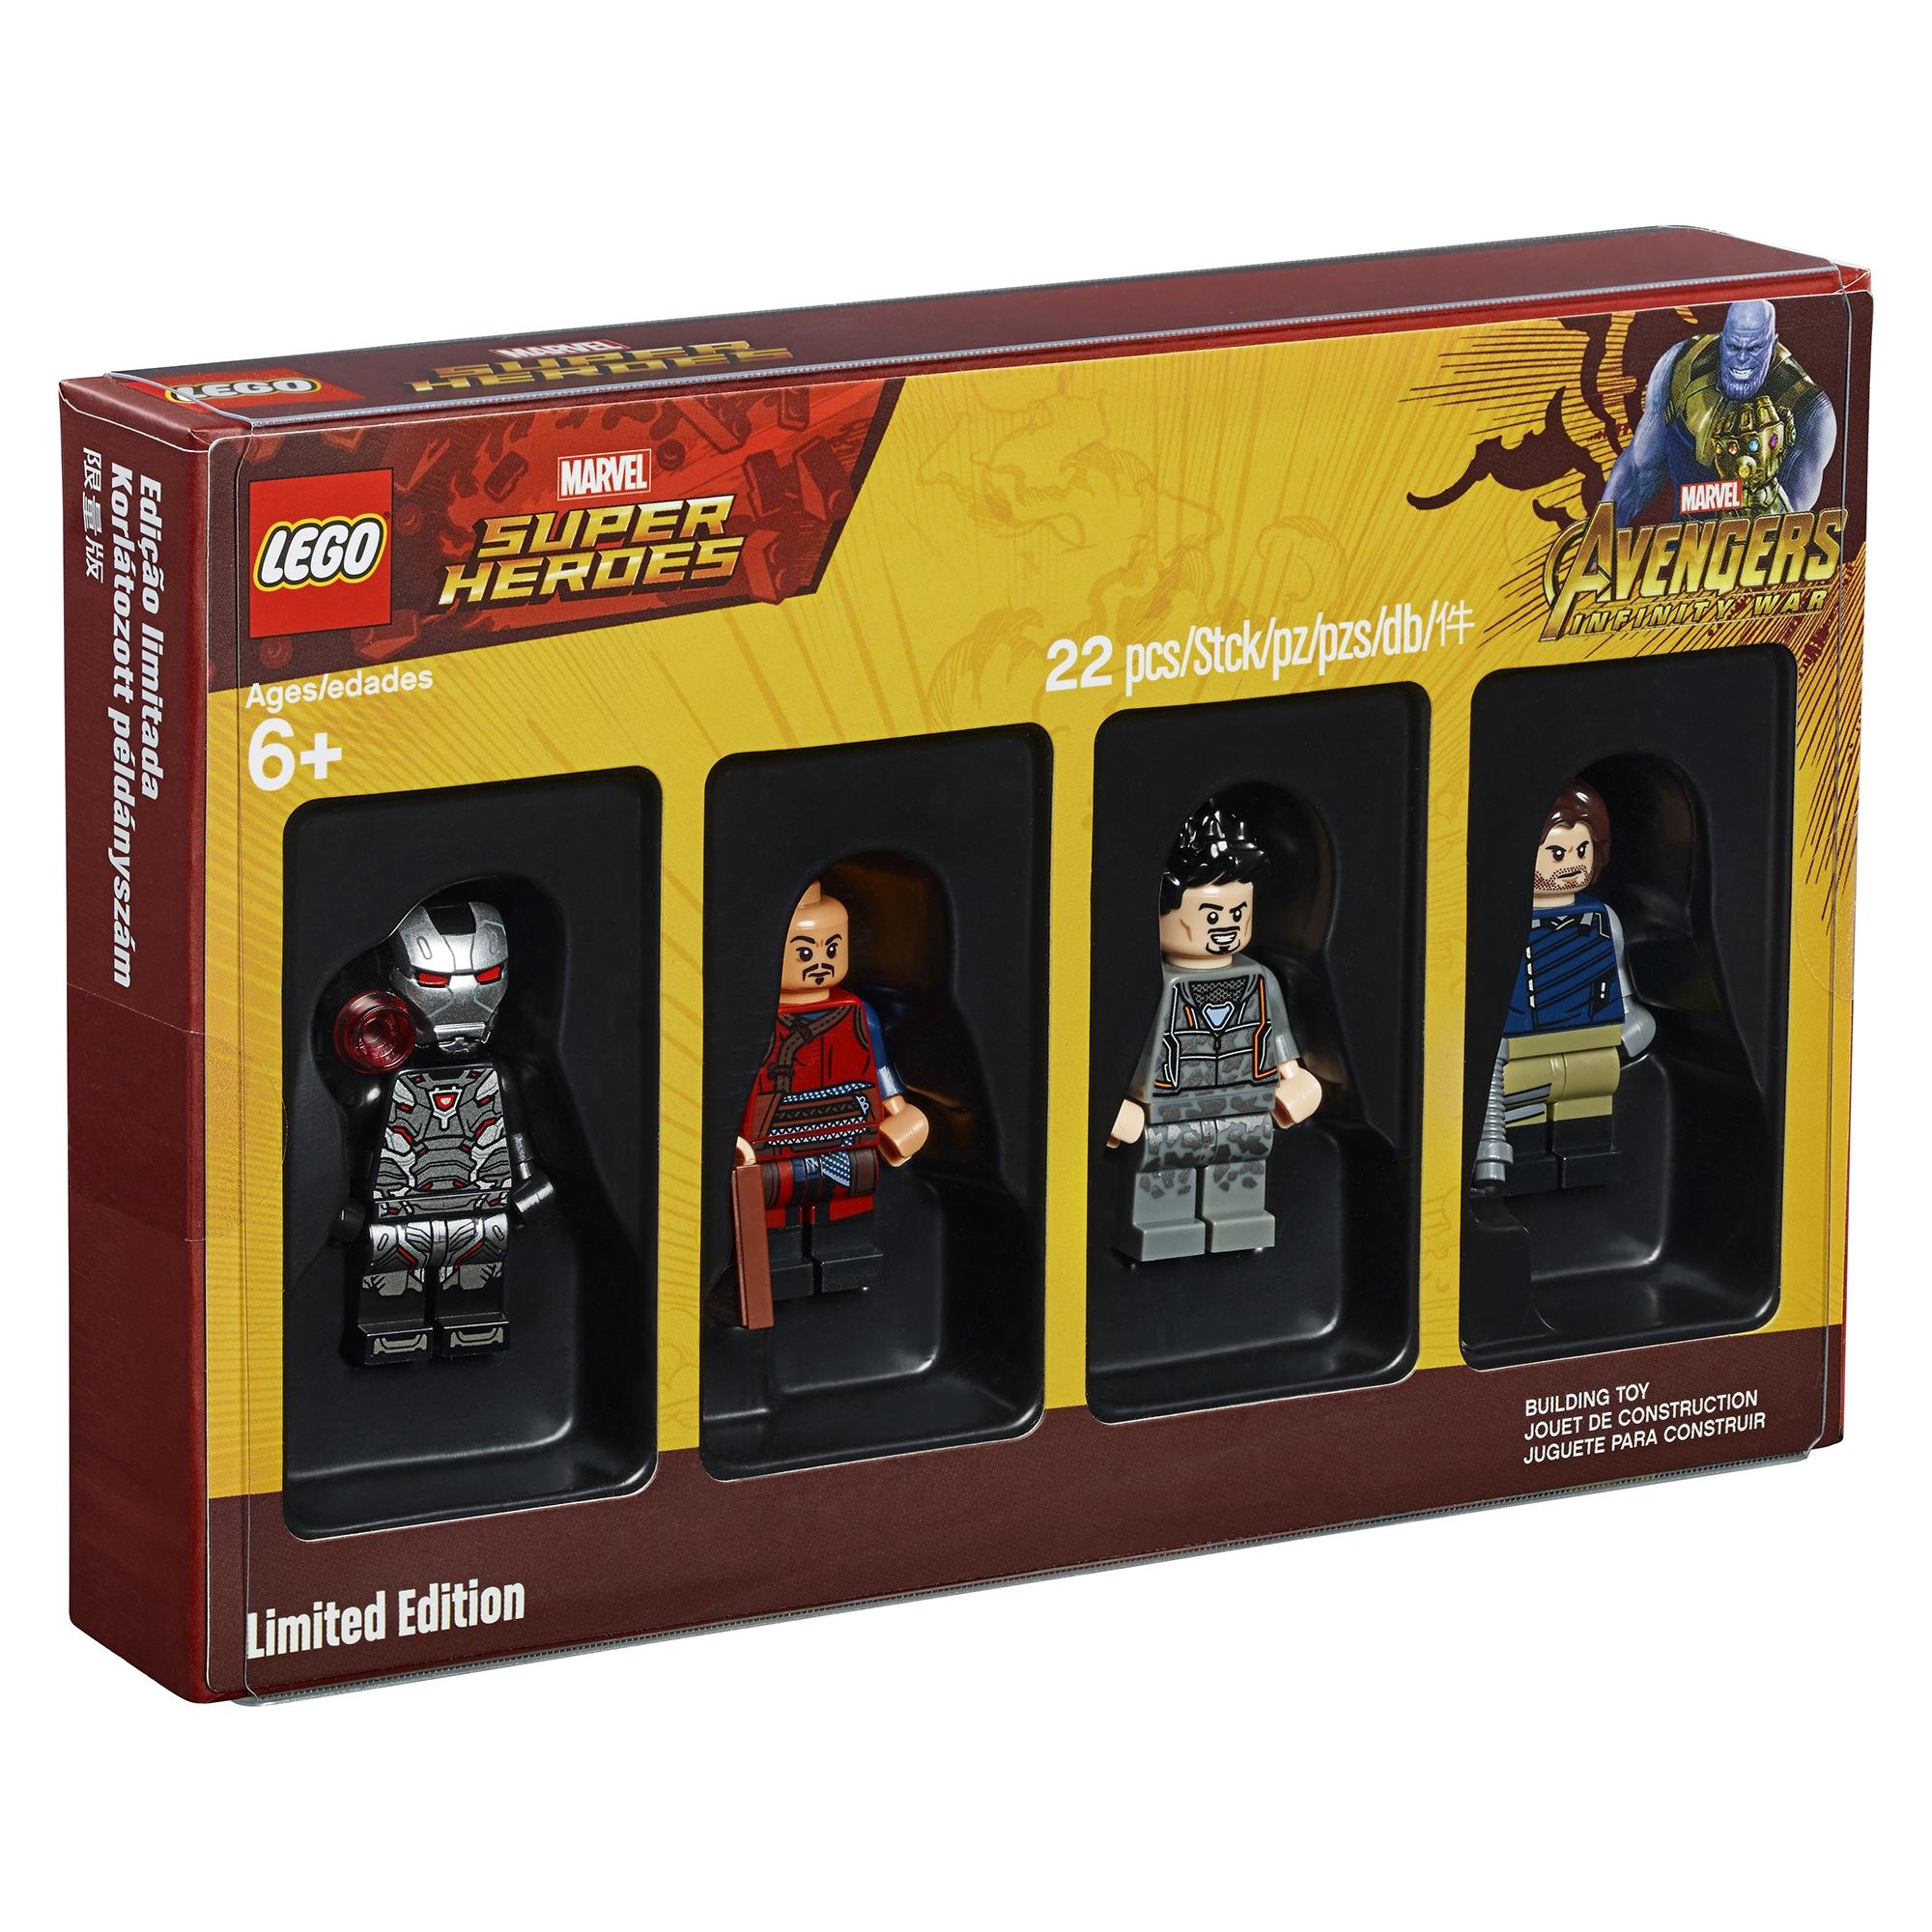 LEGO Marvel Superheroes Minifigure Set 5005256 - finally in UK £20 (instore or +£3.99 Delivery) @ Hamleys